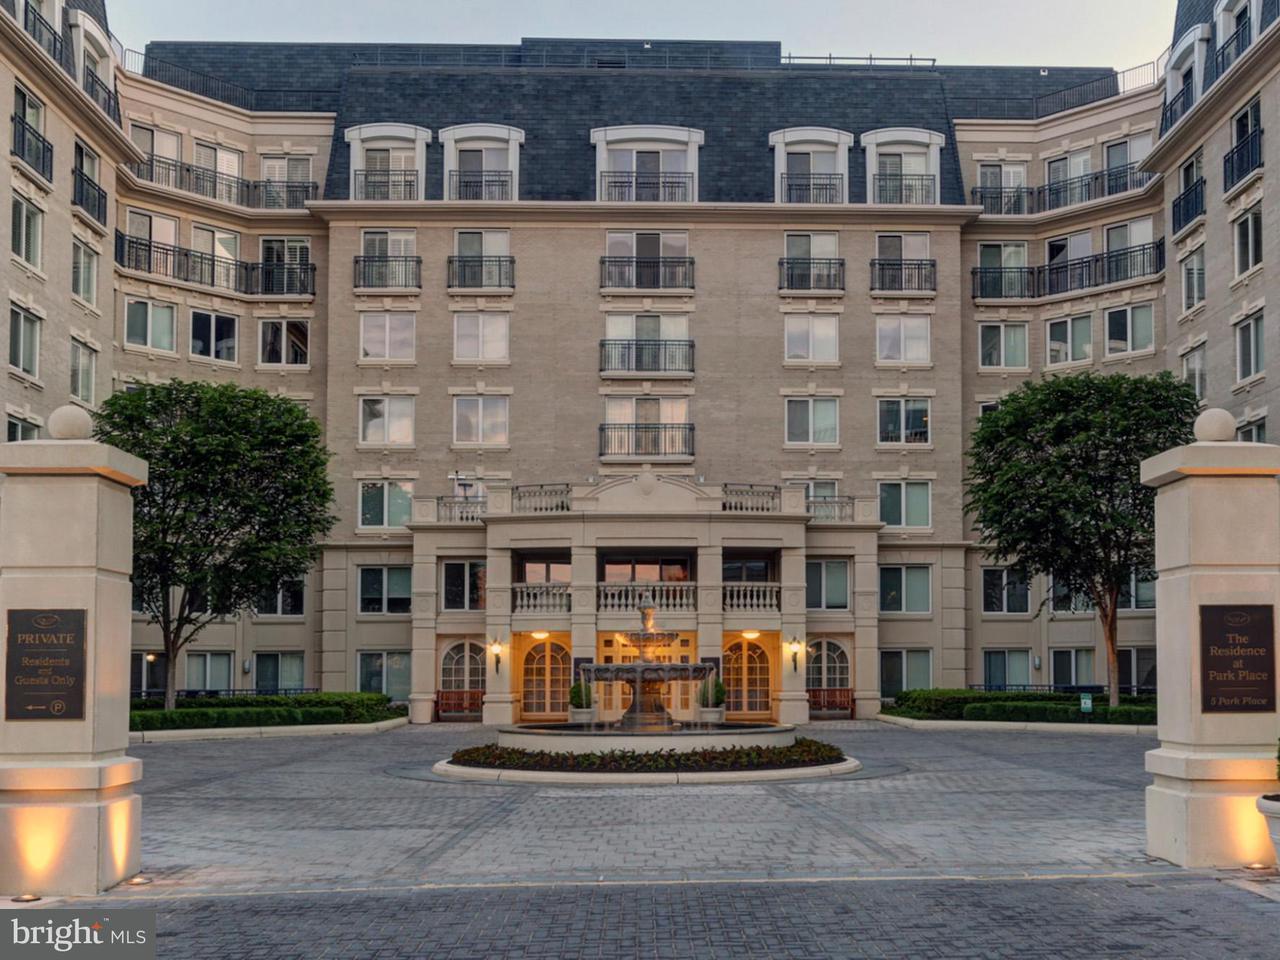 Condominium for Sale at 5 Park Pl #409 5 Park Pl #409 Annapolis, Maryland 21401 United States